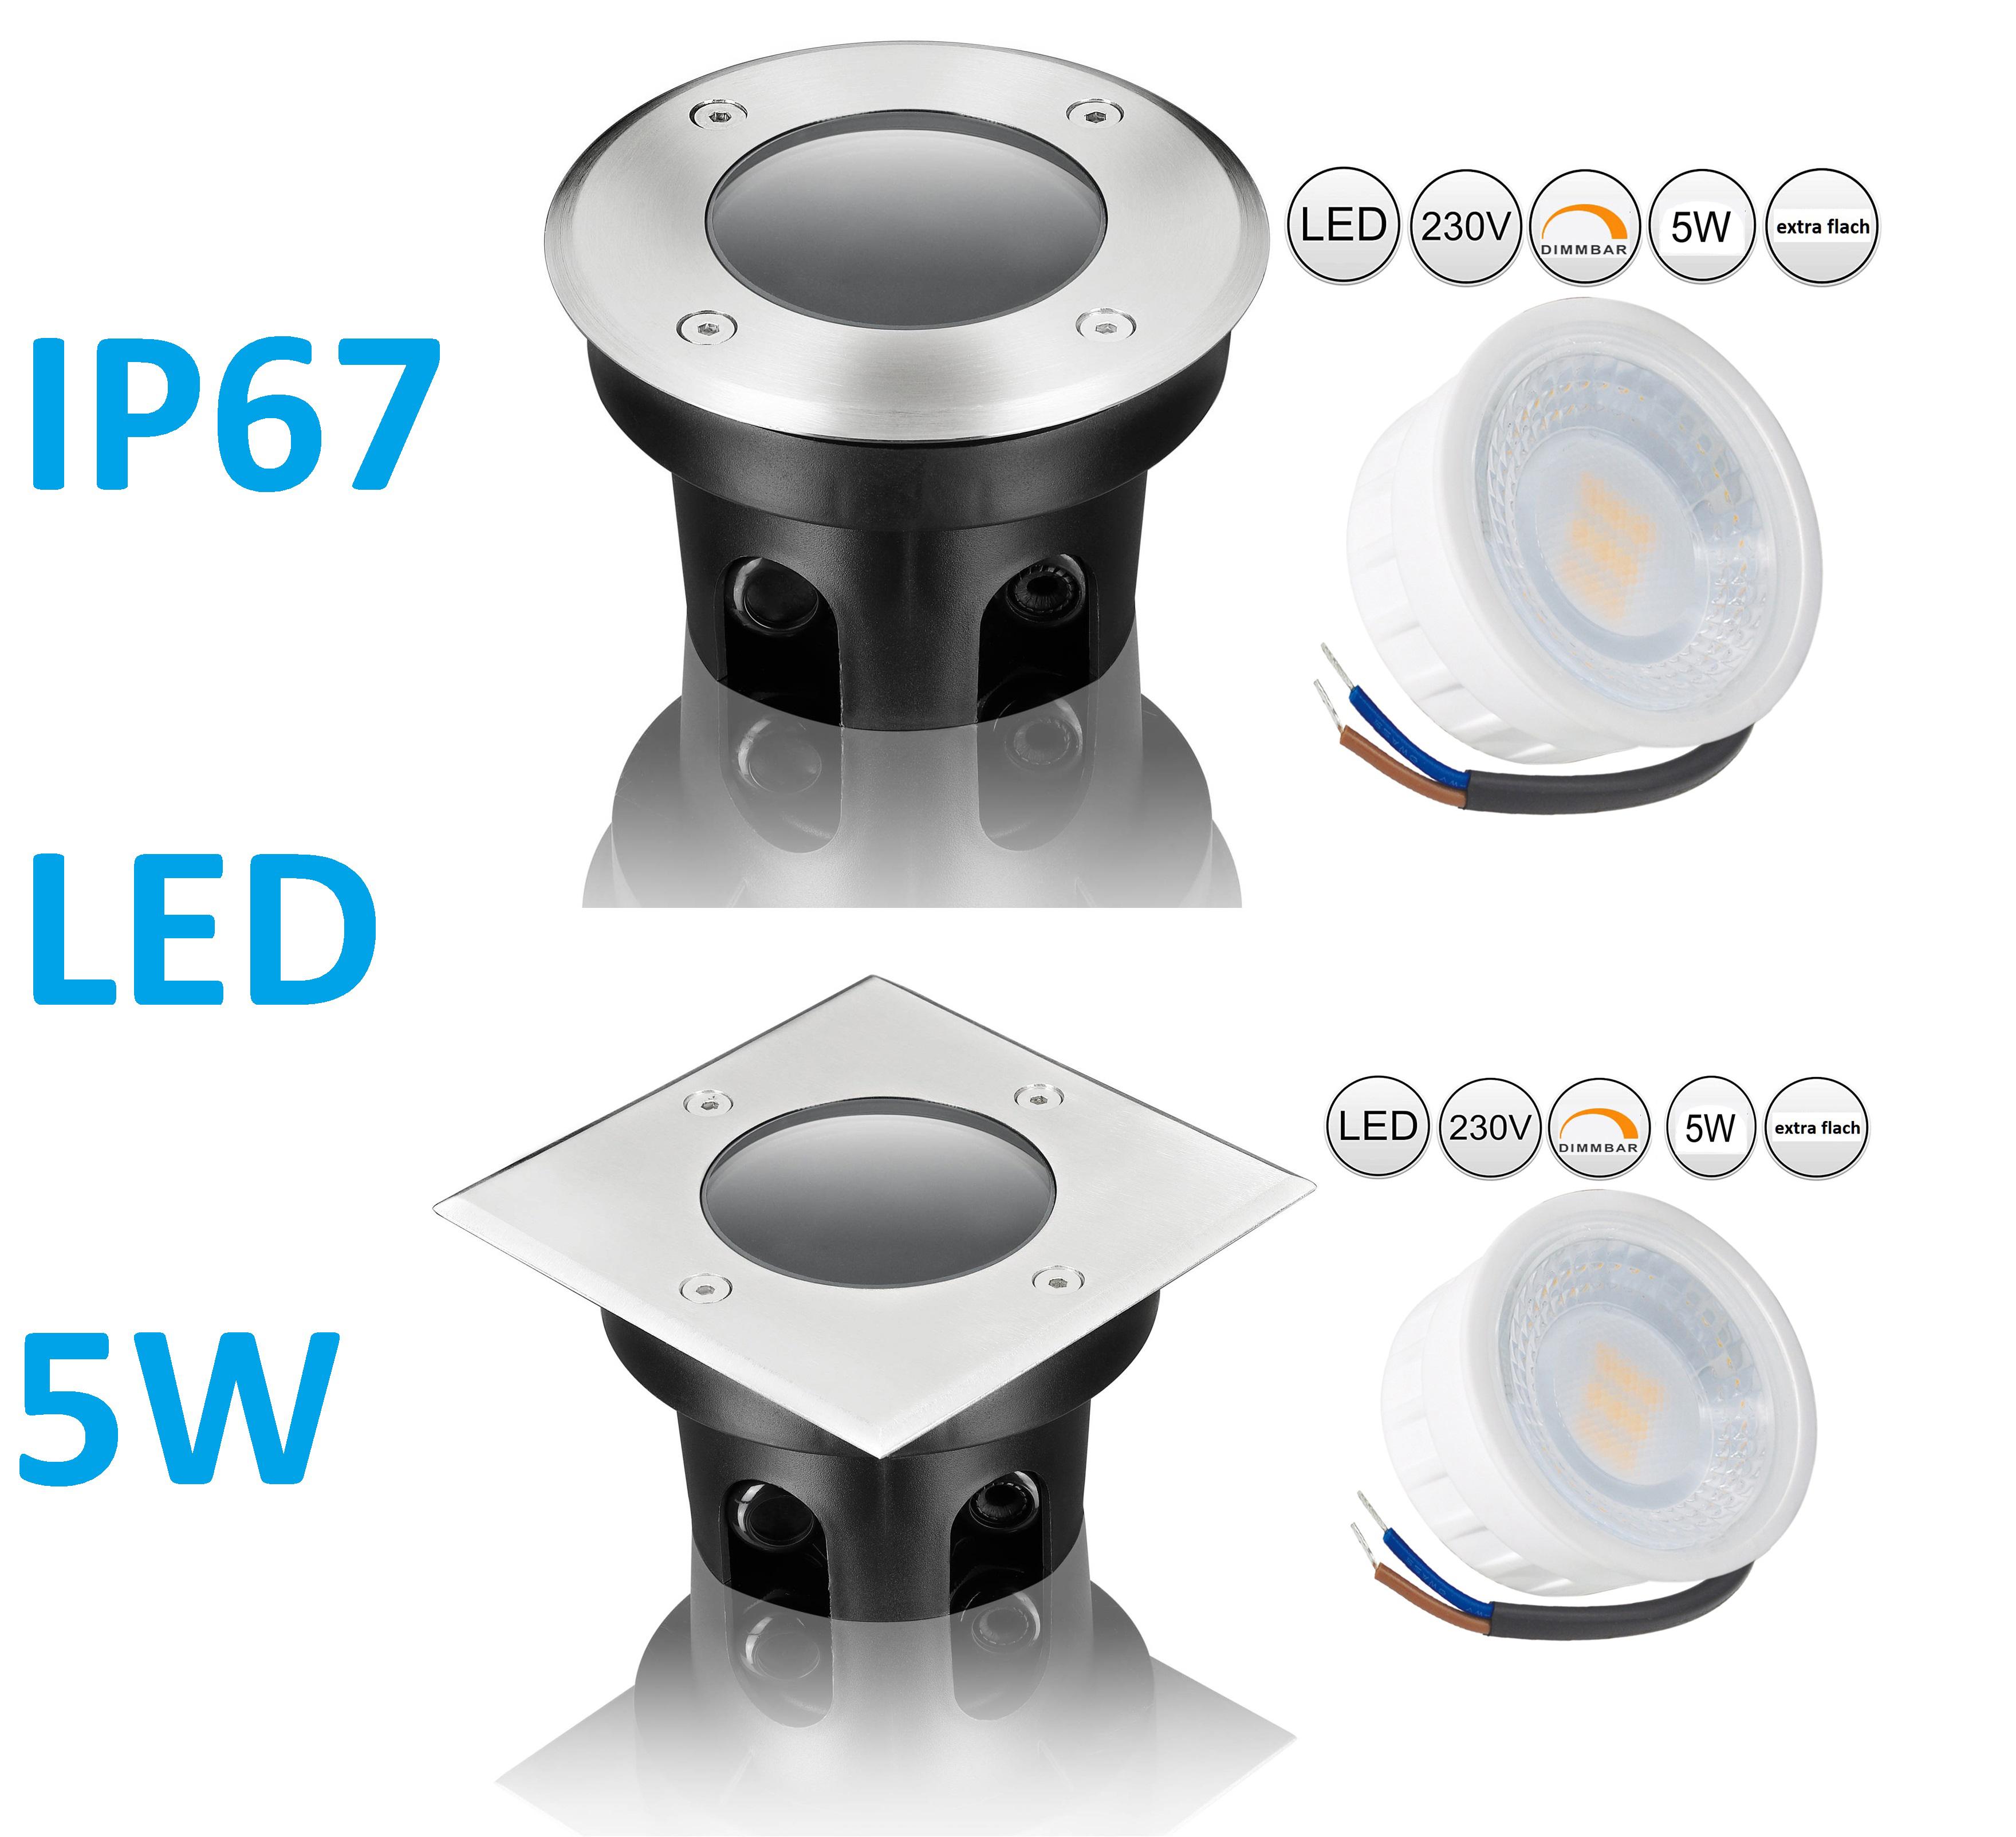 LED Außenleuchten 230V